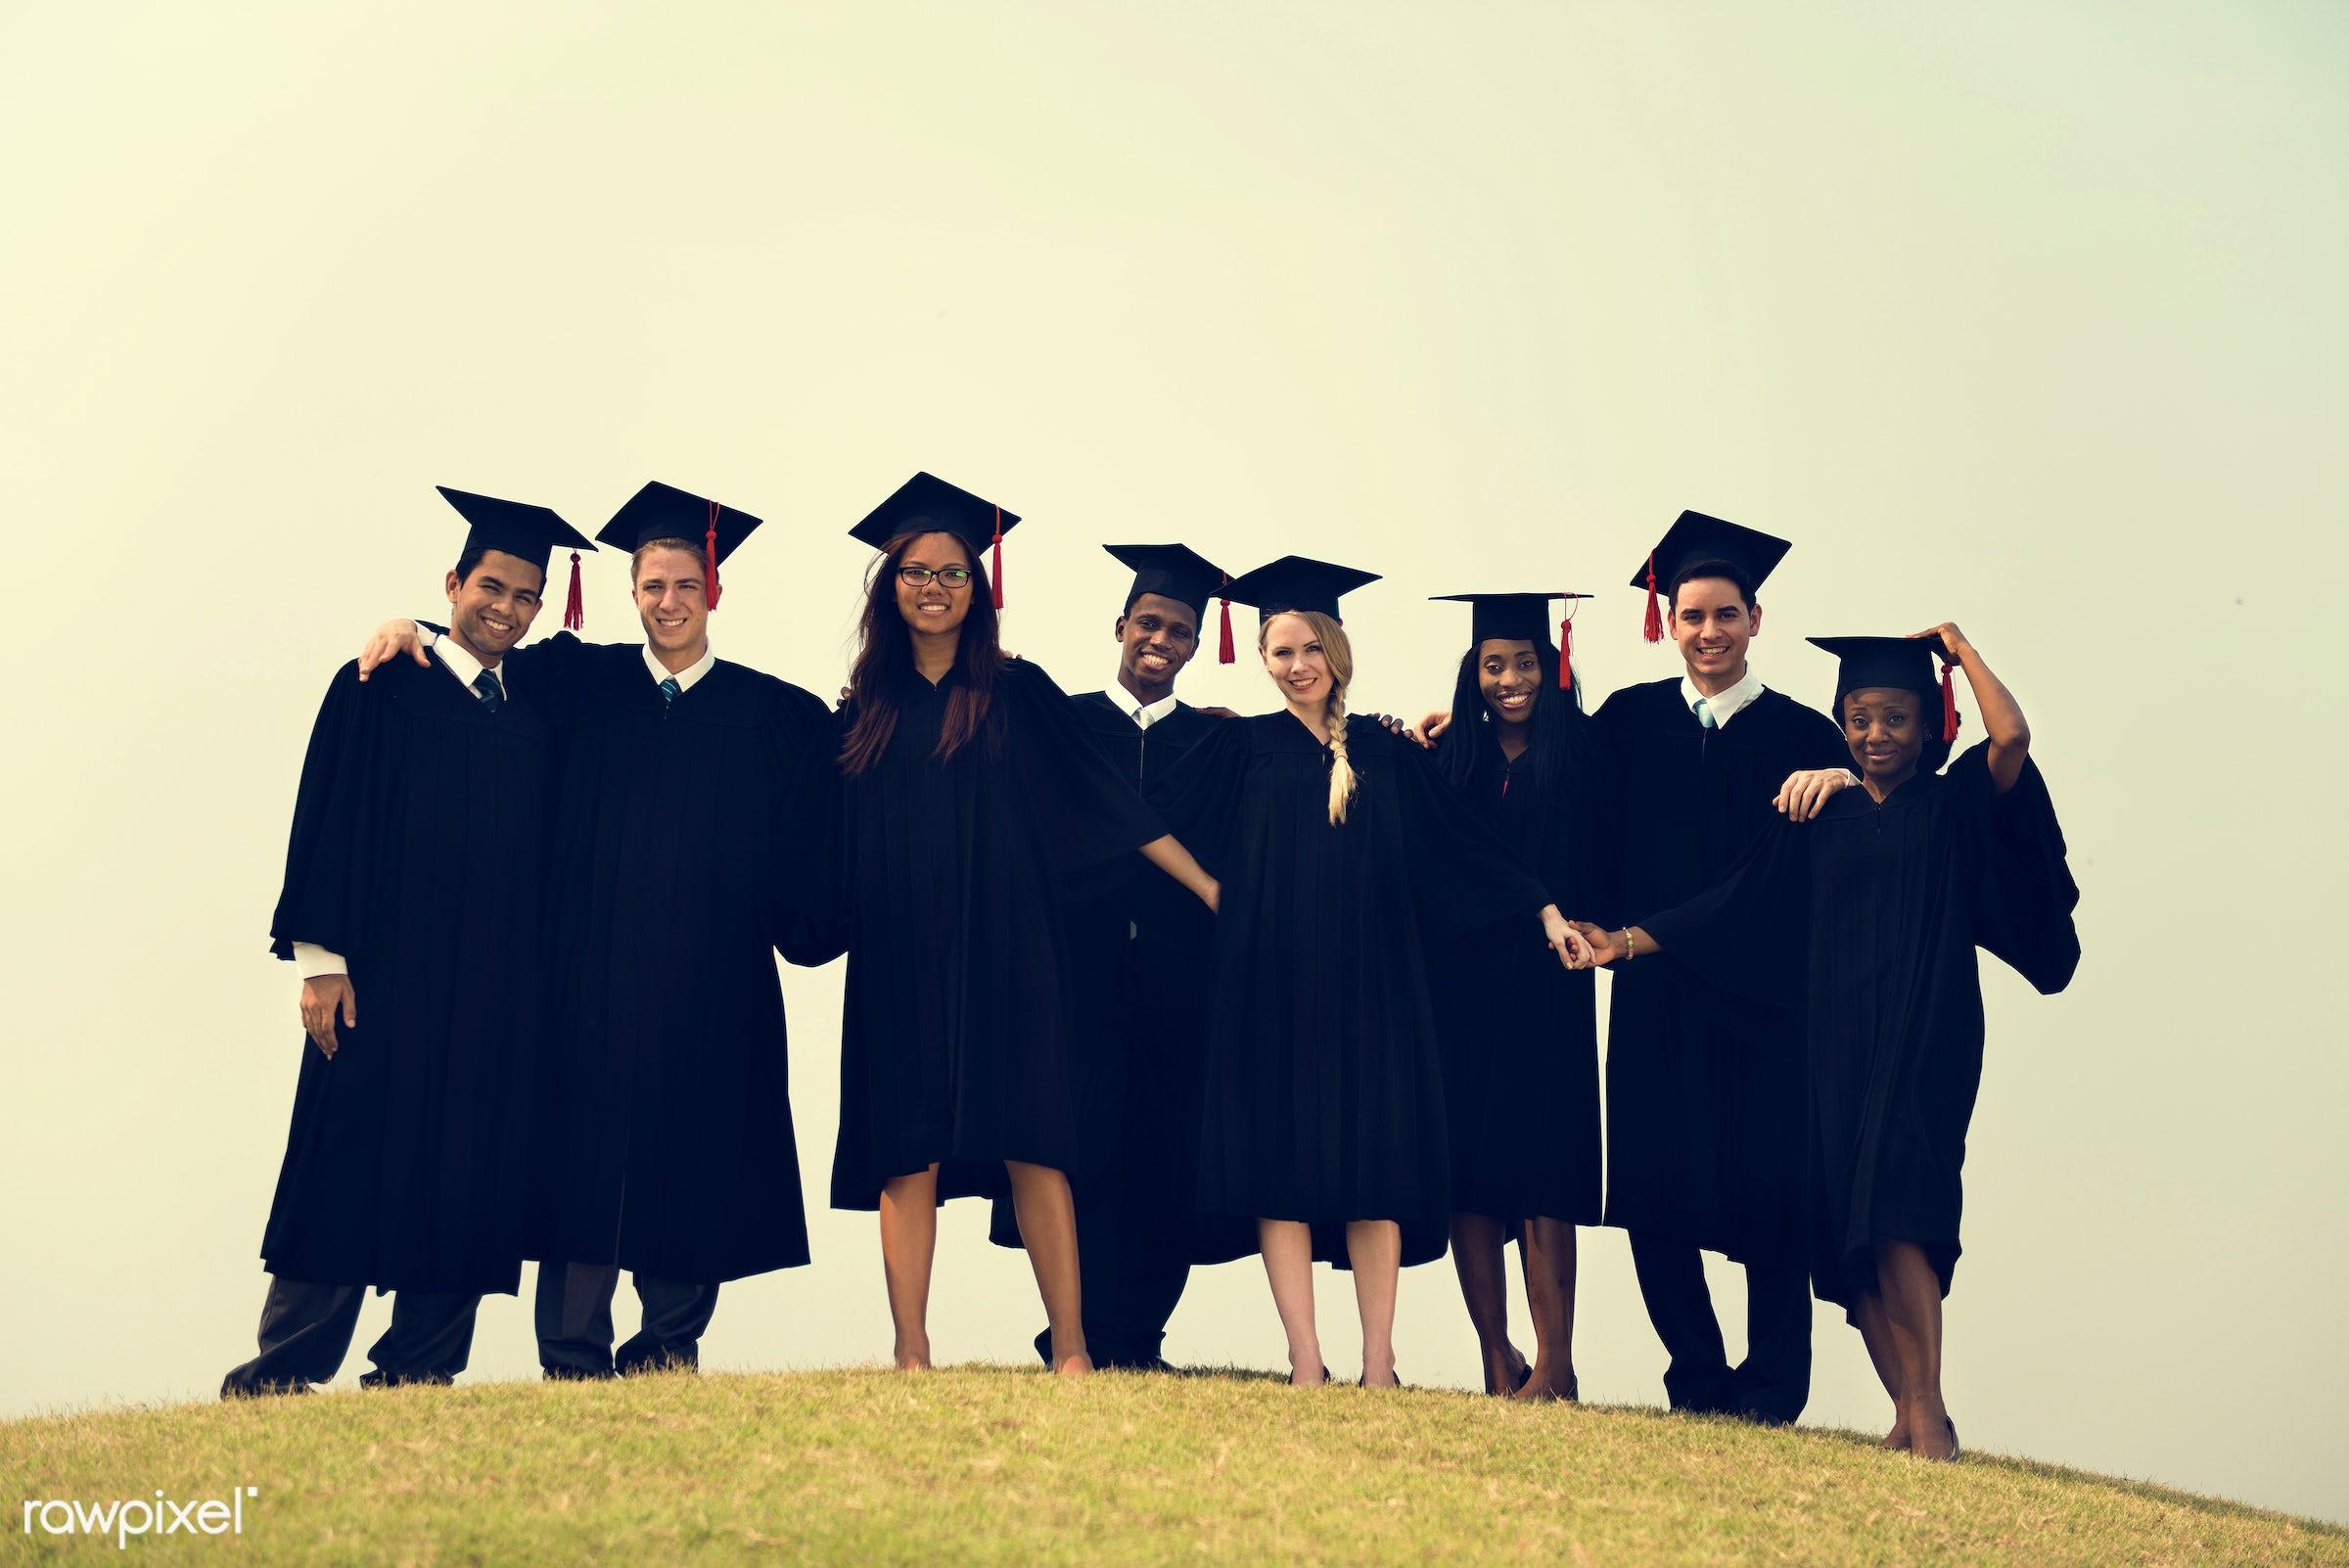 graduate, achievement, african, alumni, asian, best friends, caucasian, celebrate, celebration, cheerful, classmates,...